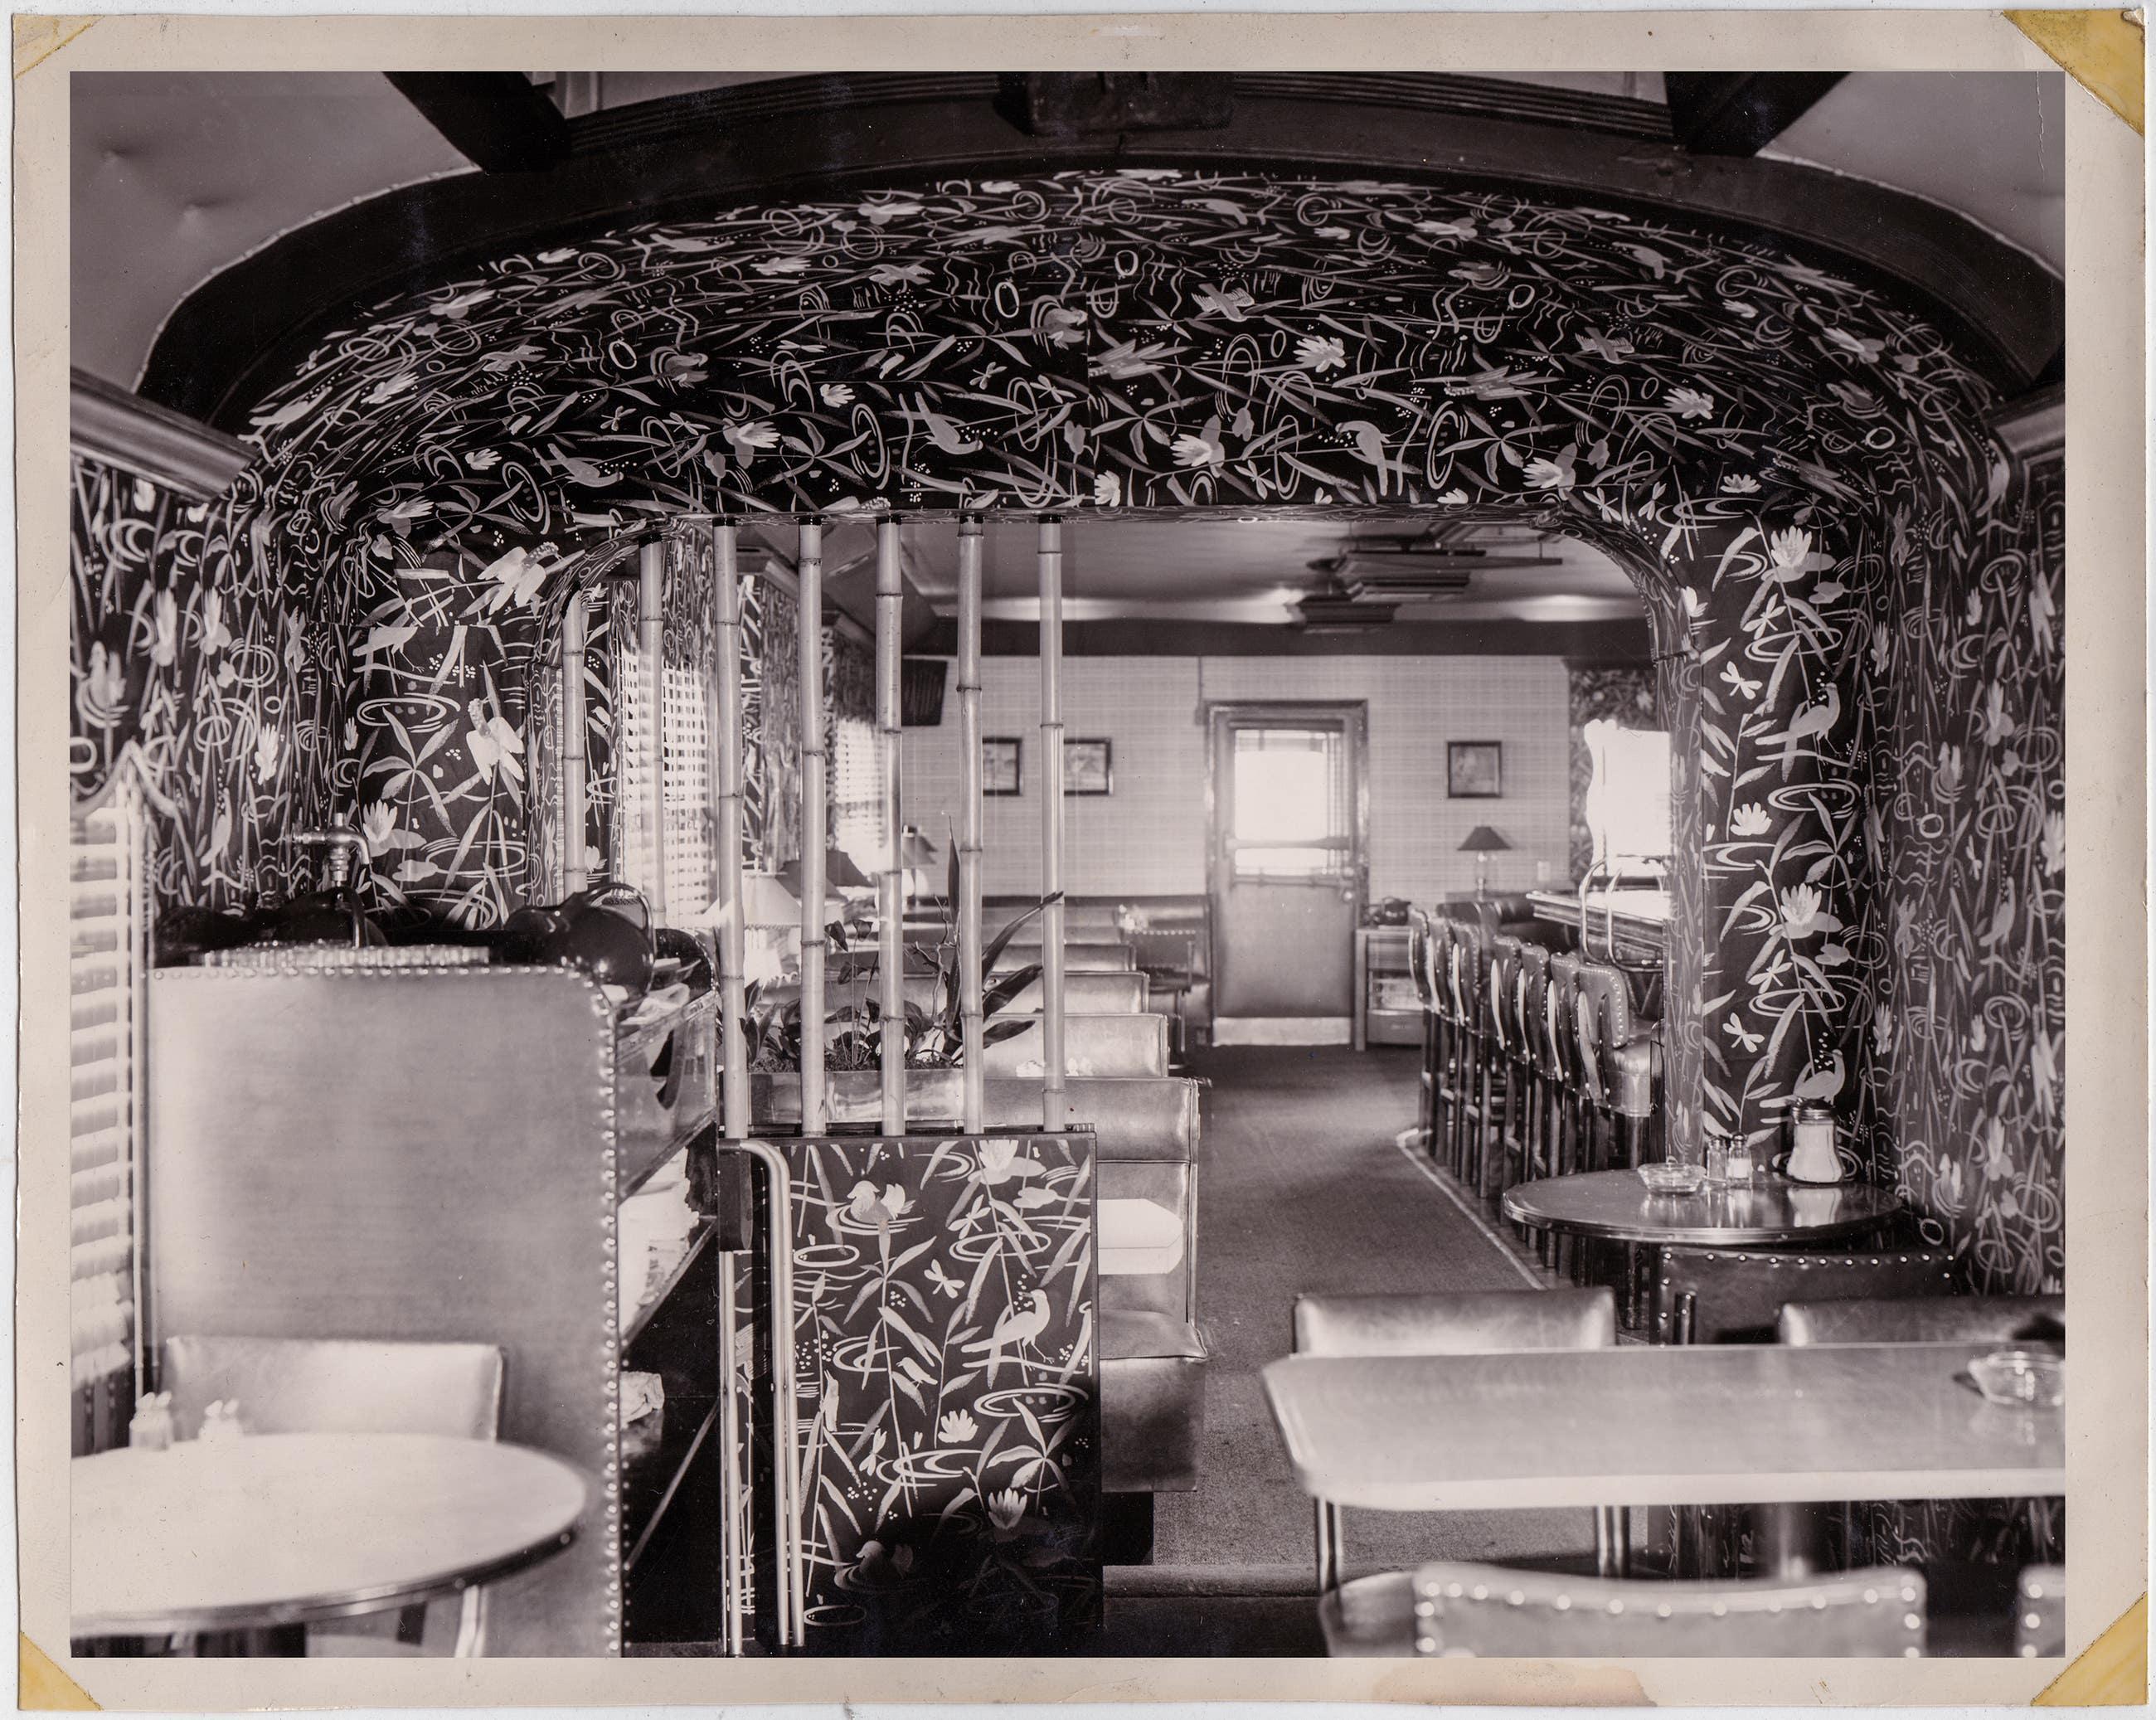 Vintage photo of the Formosa Cafe interior